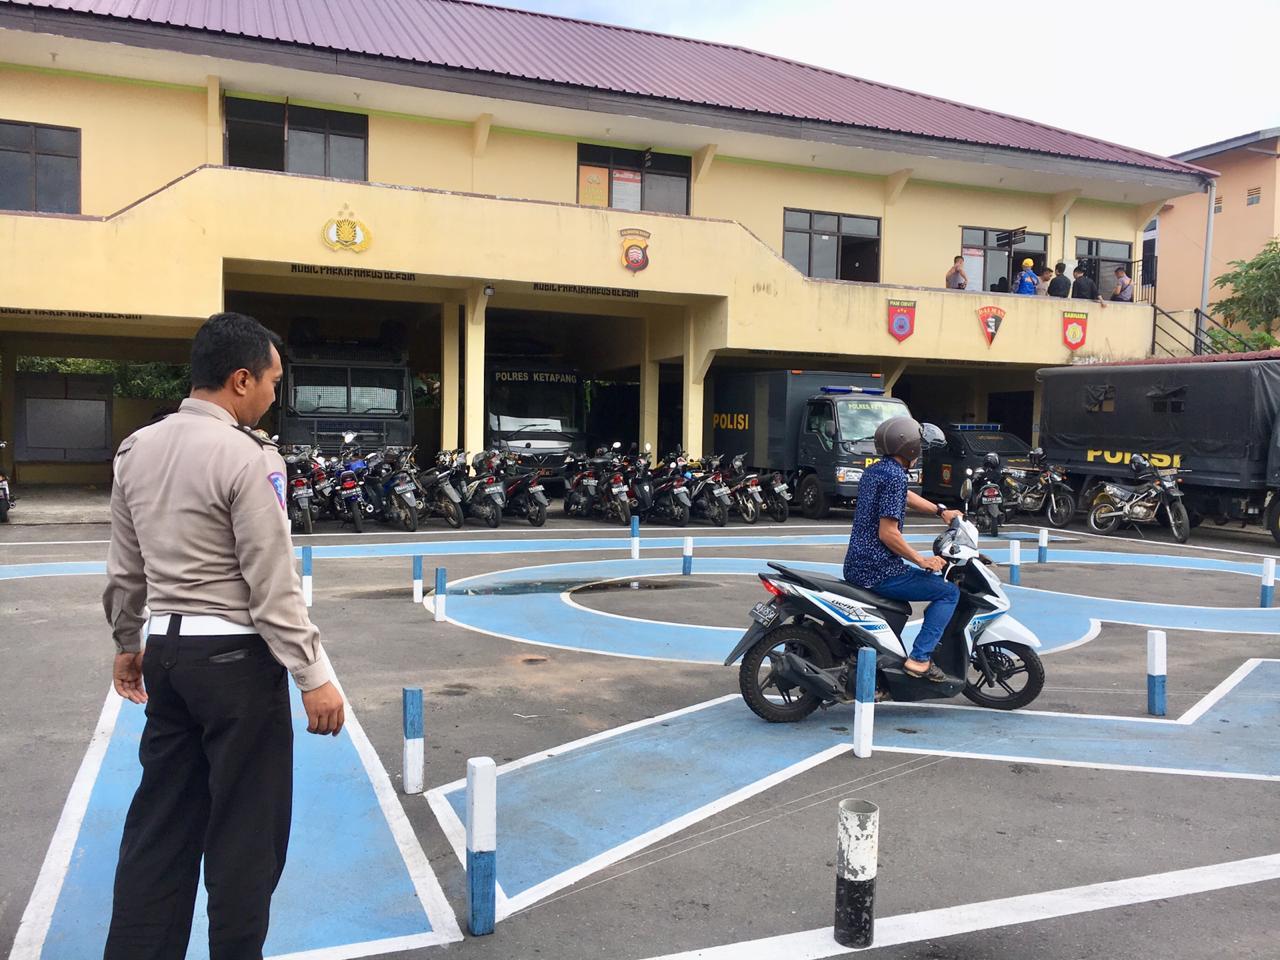 Teknik yang Dipakai pada Saat Ujian Praktek Kendaraan Roda 2